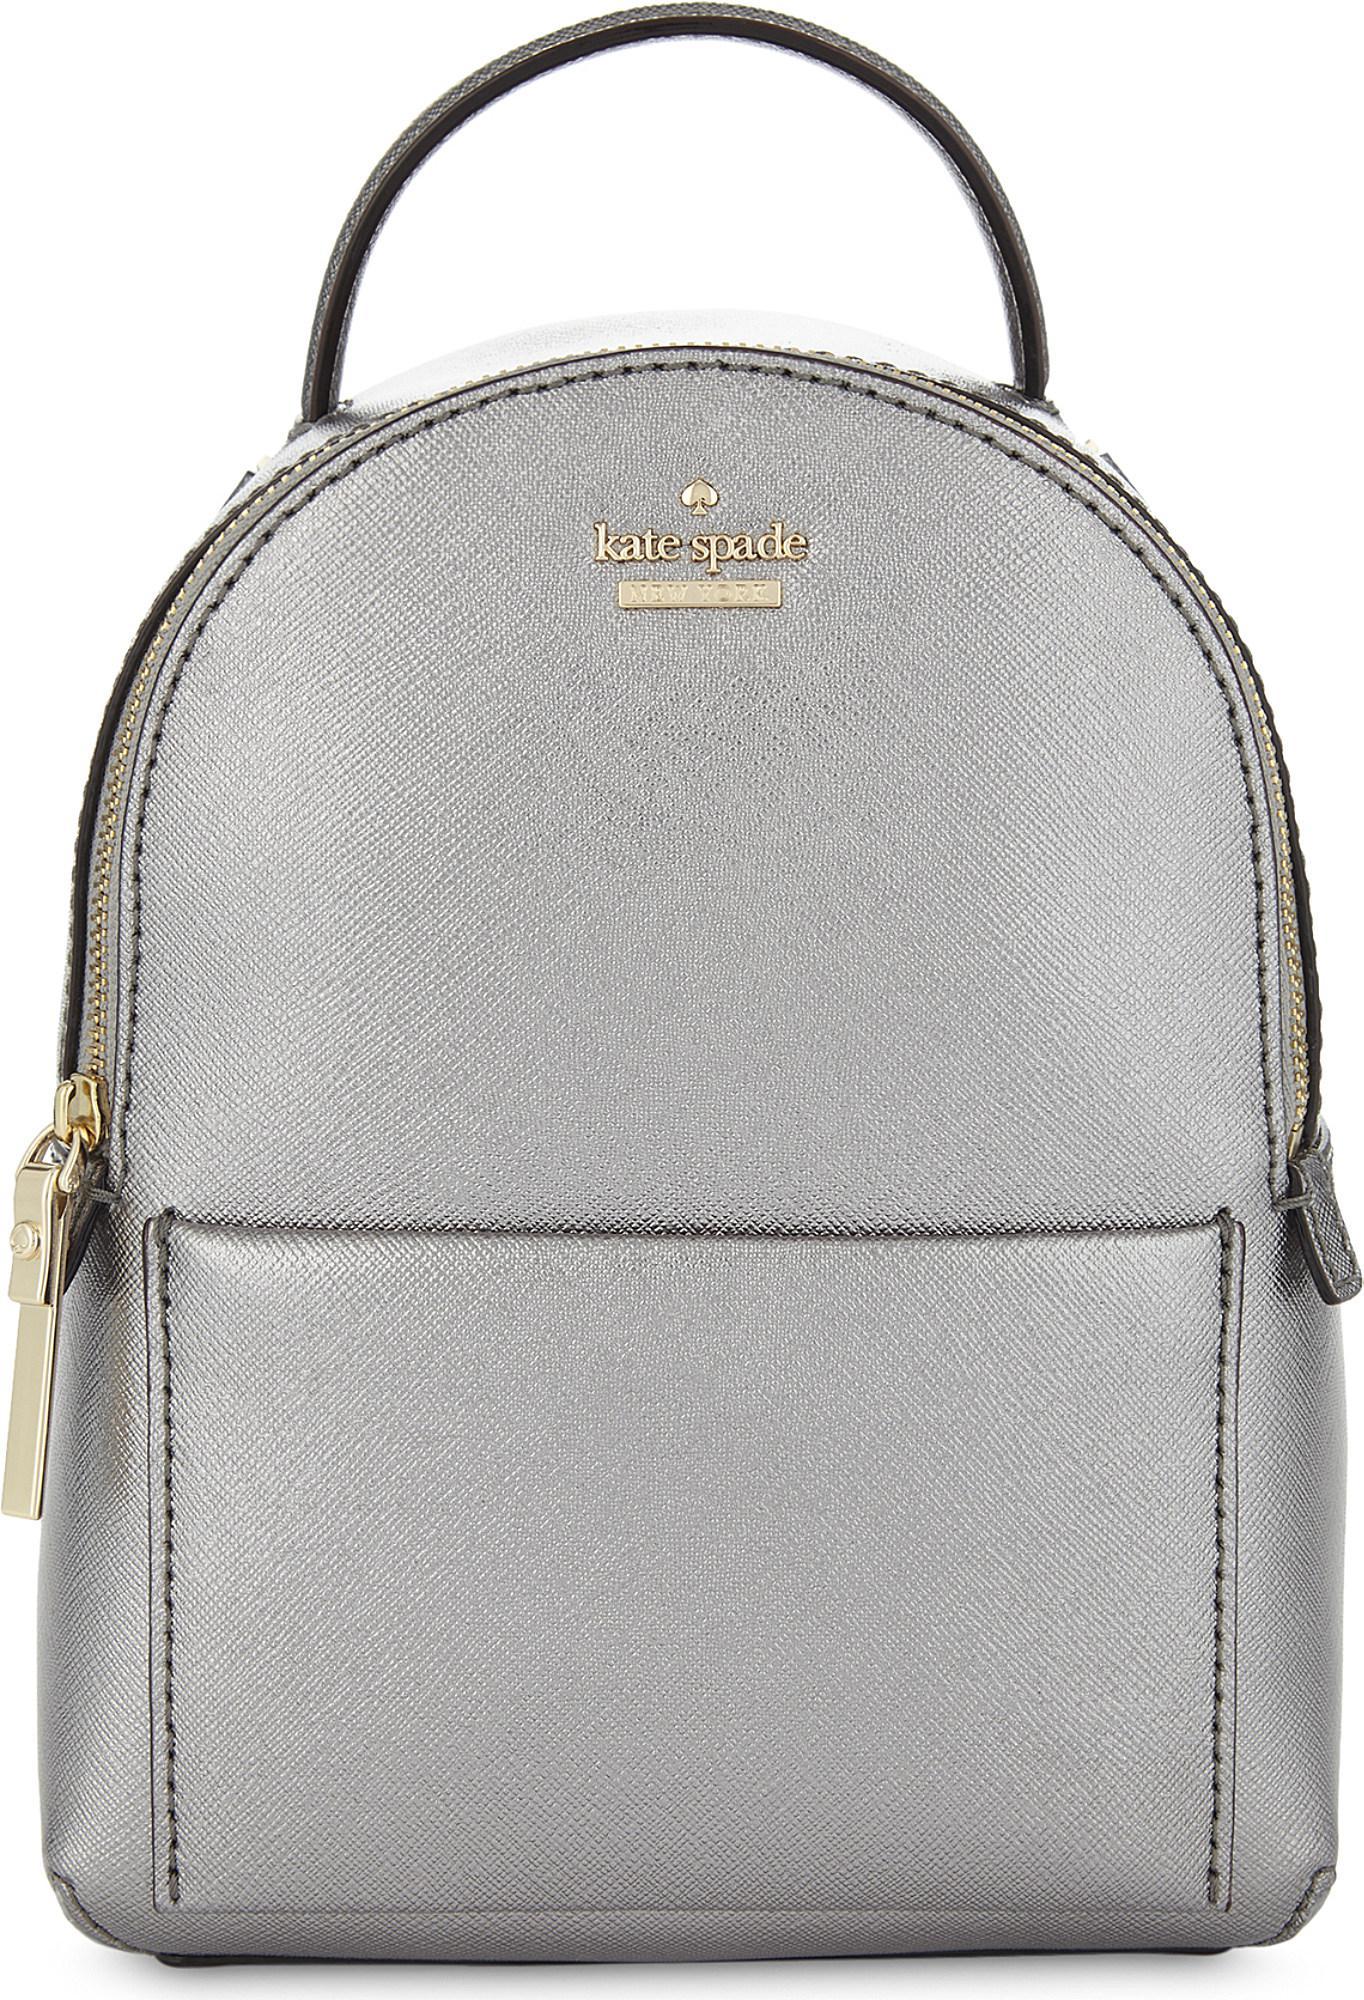 Mini Backpack Purse Kate Spade